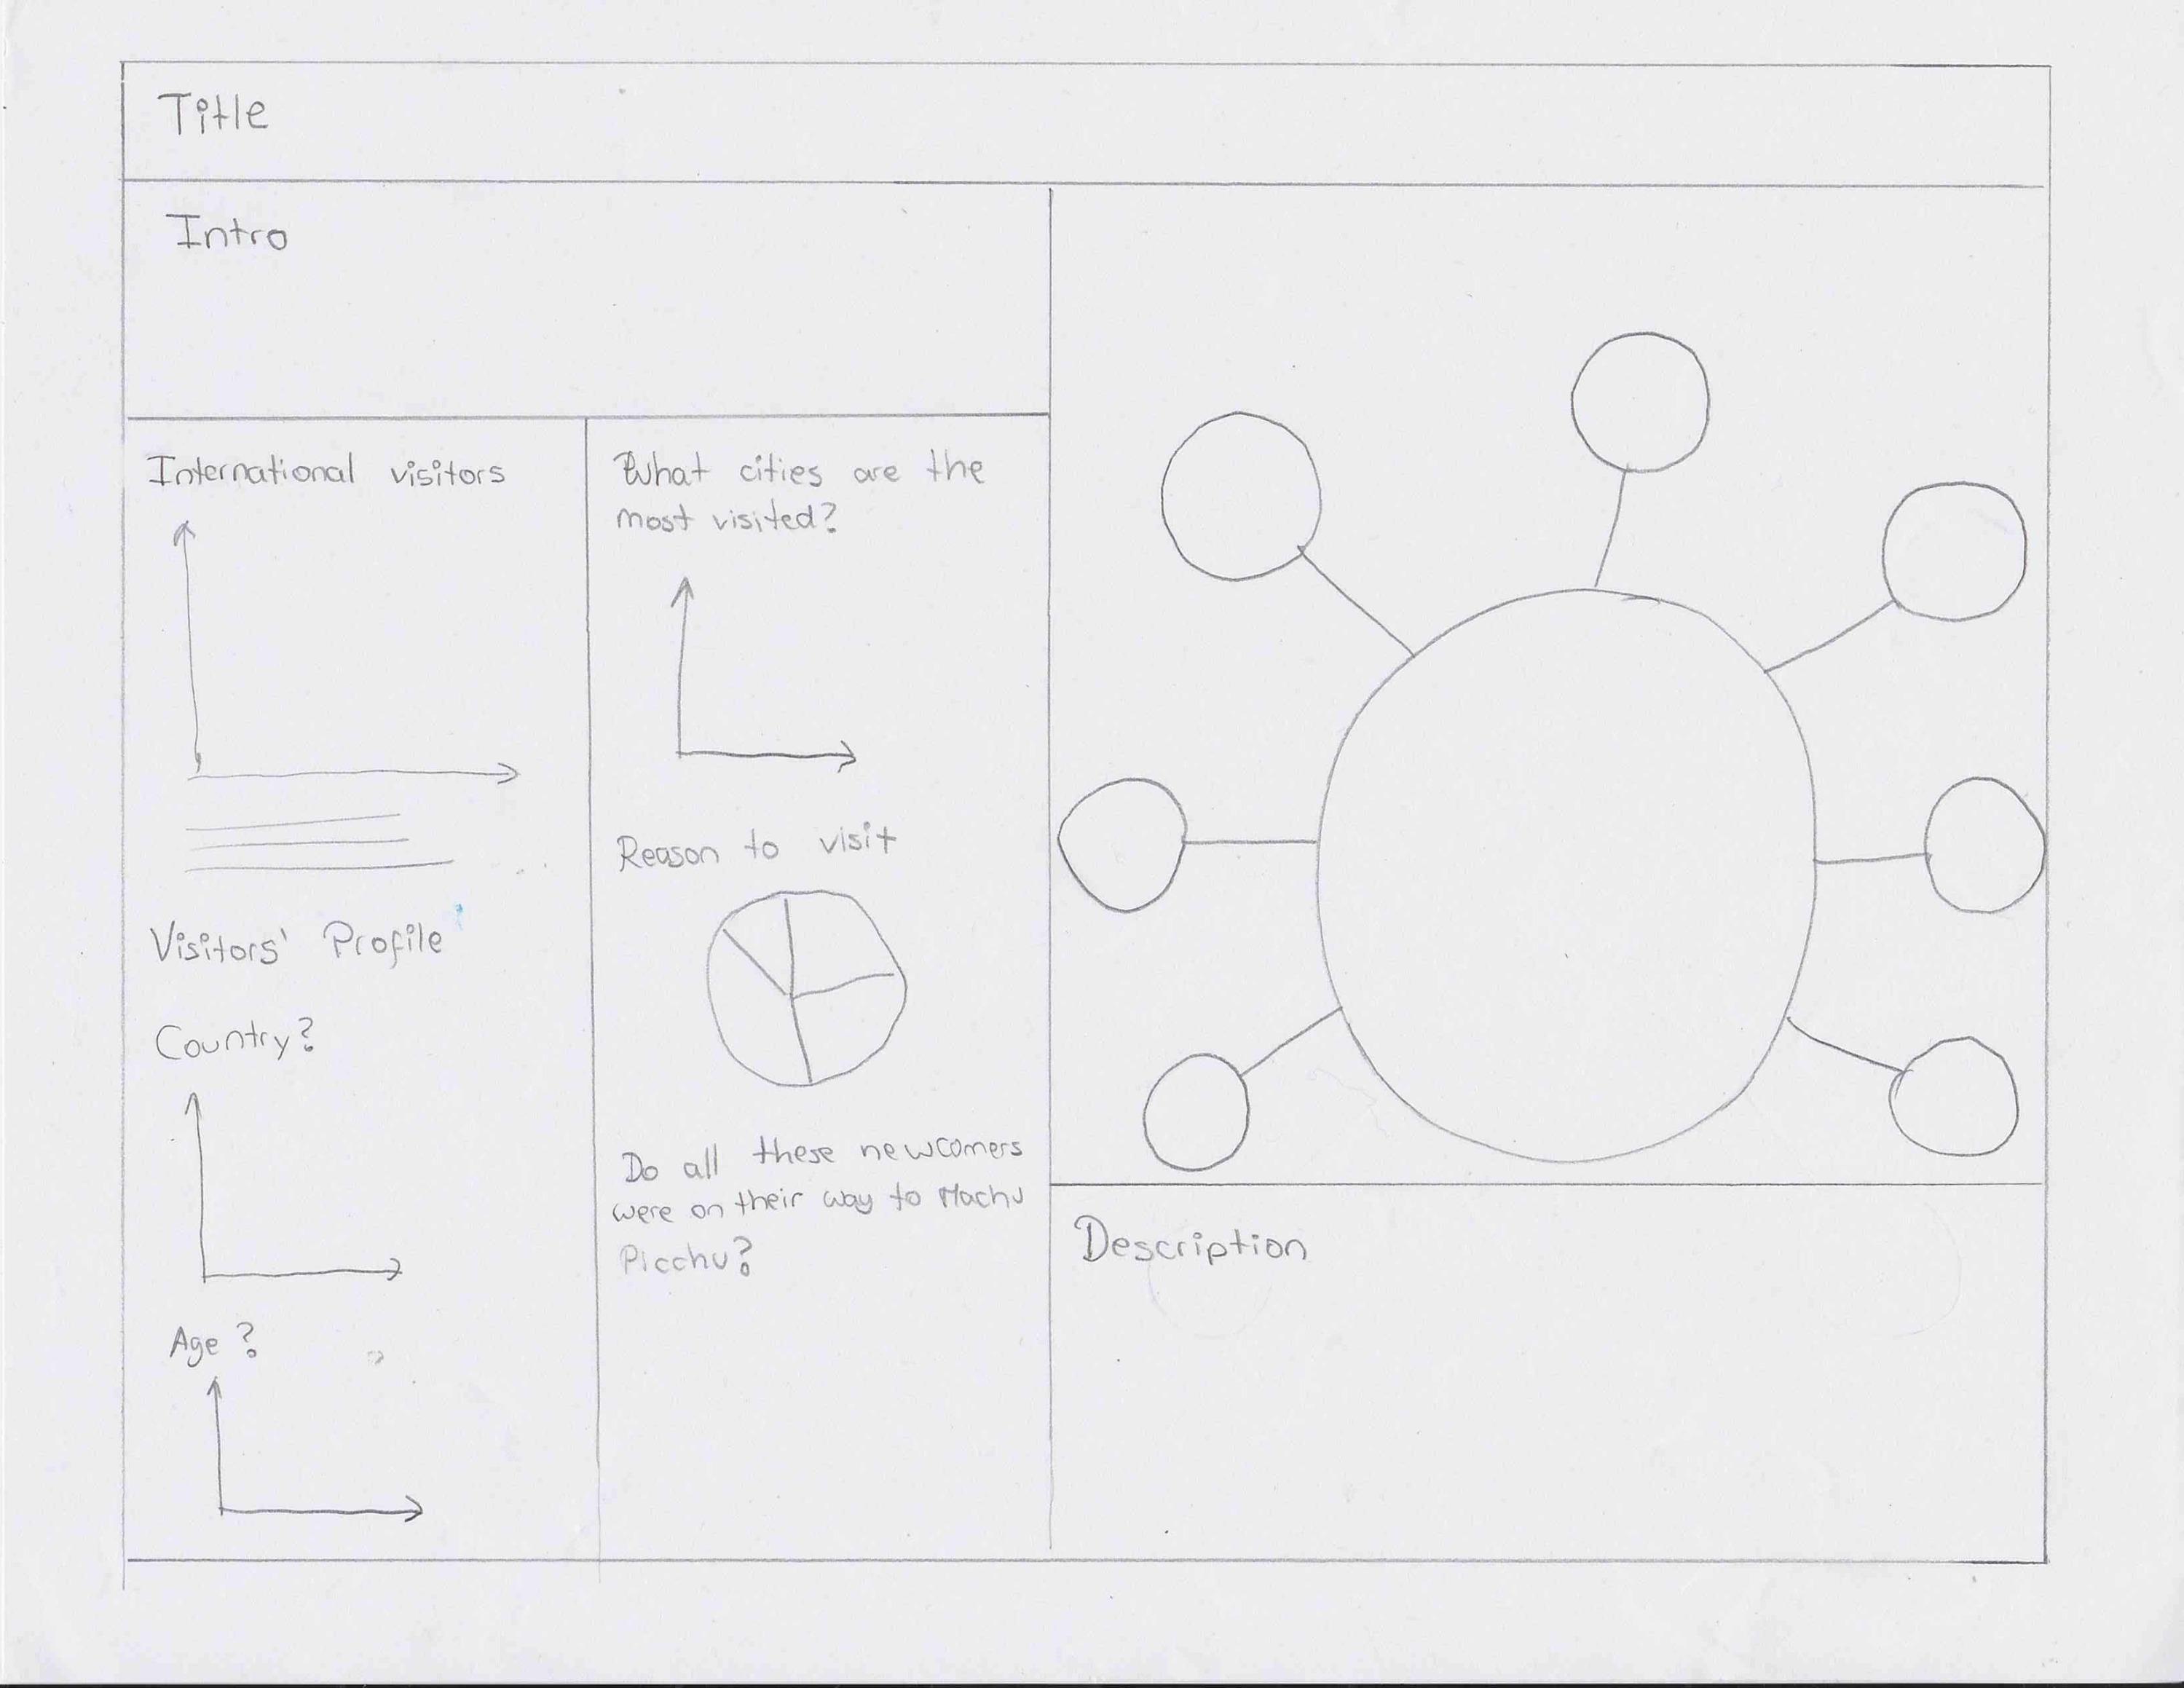 Project5 Draft3